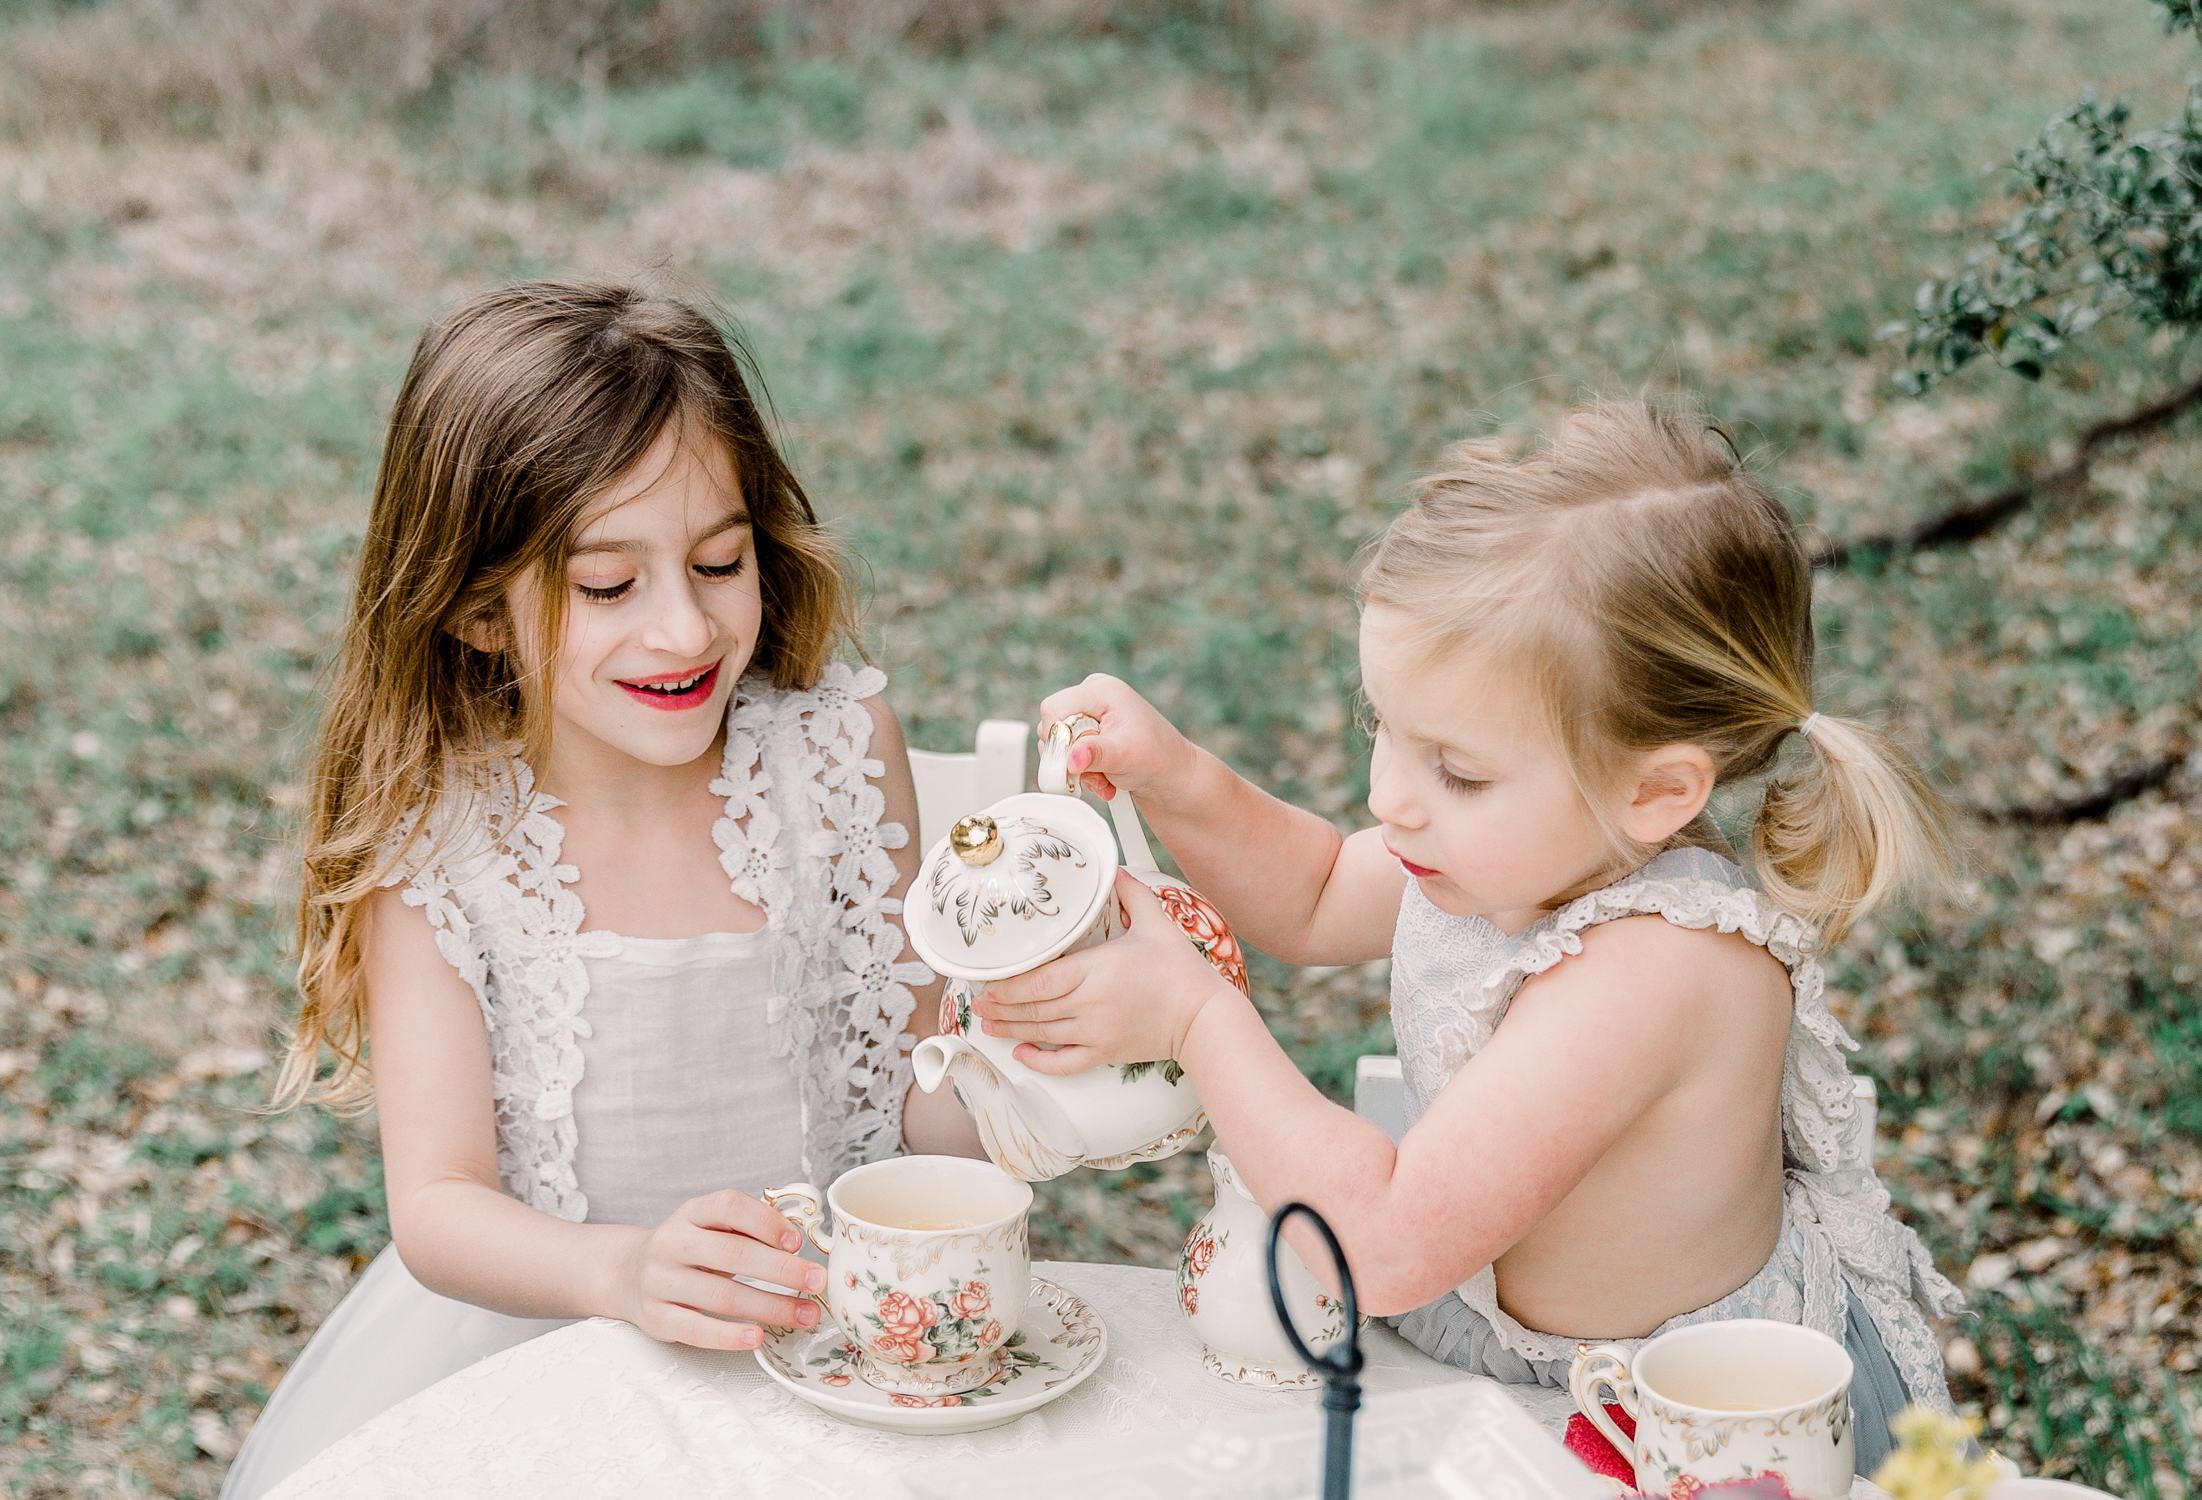 lifestyle-family-photographer-franklin-tea-time-27.jpg